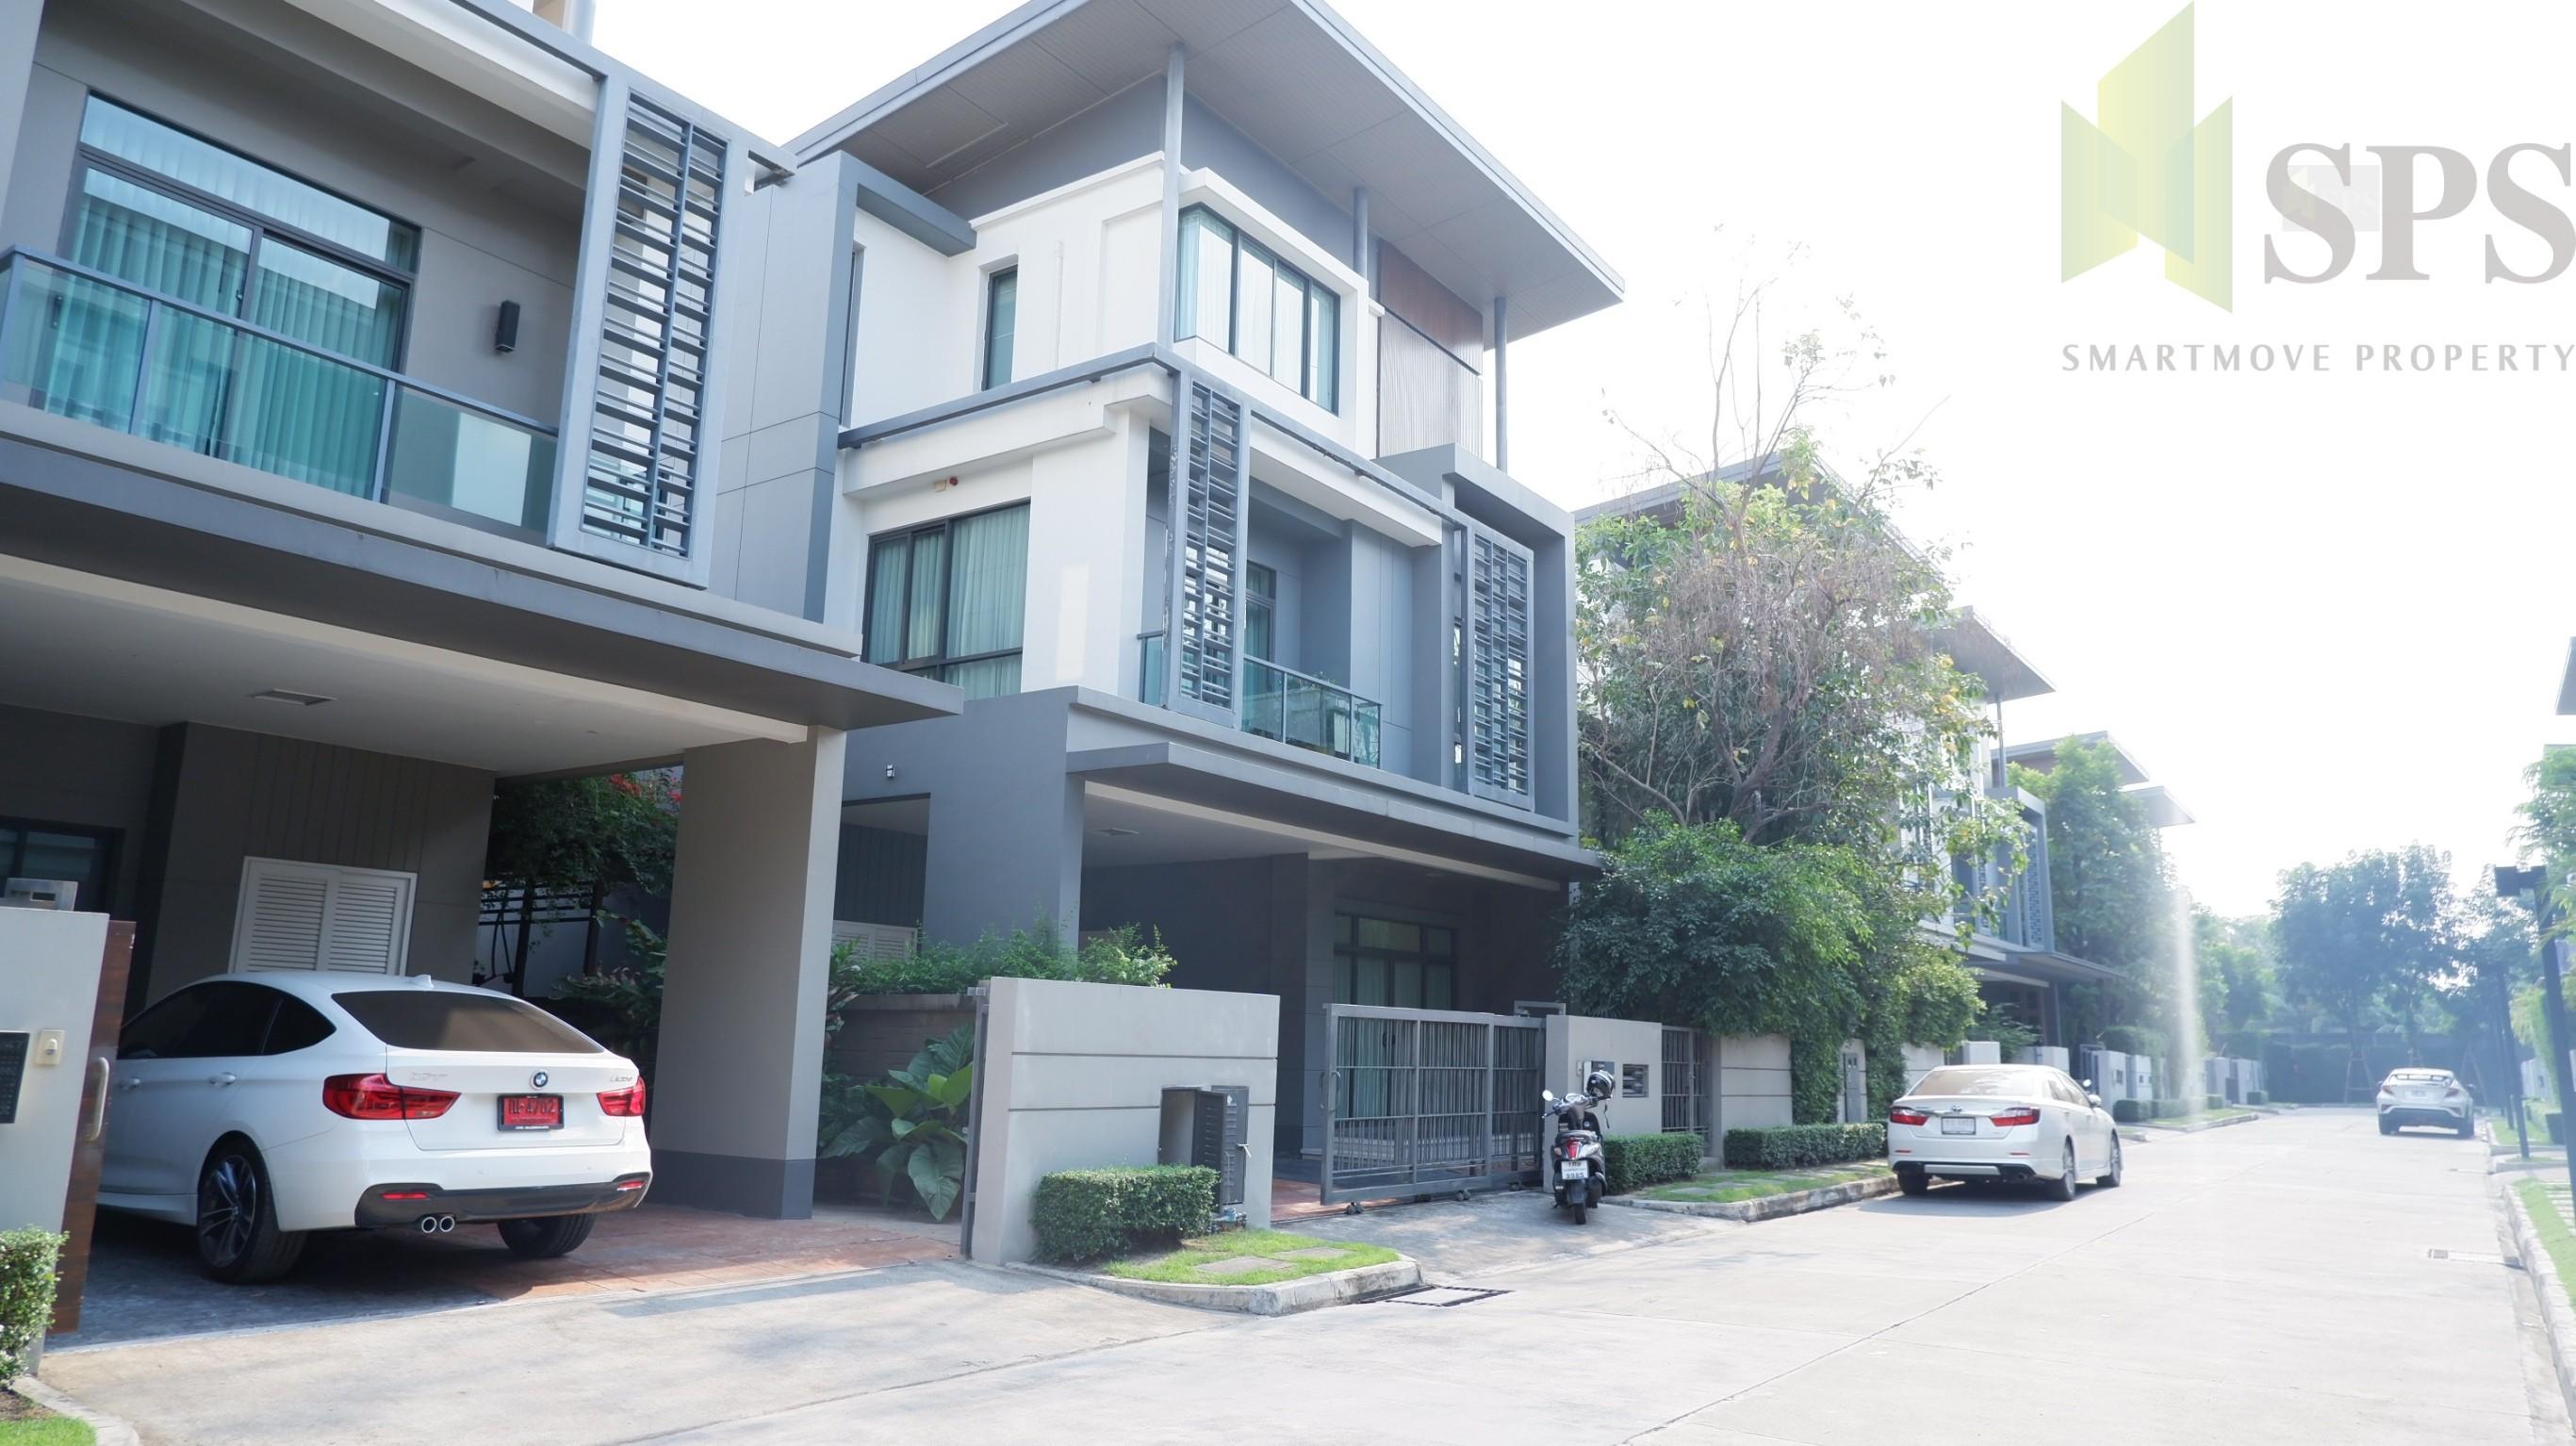 Exclusive House For sale at Narasiri Hideaway (นาราสิริ ไฮด์อเวย์) Property ID: SPS-PP126